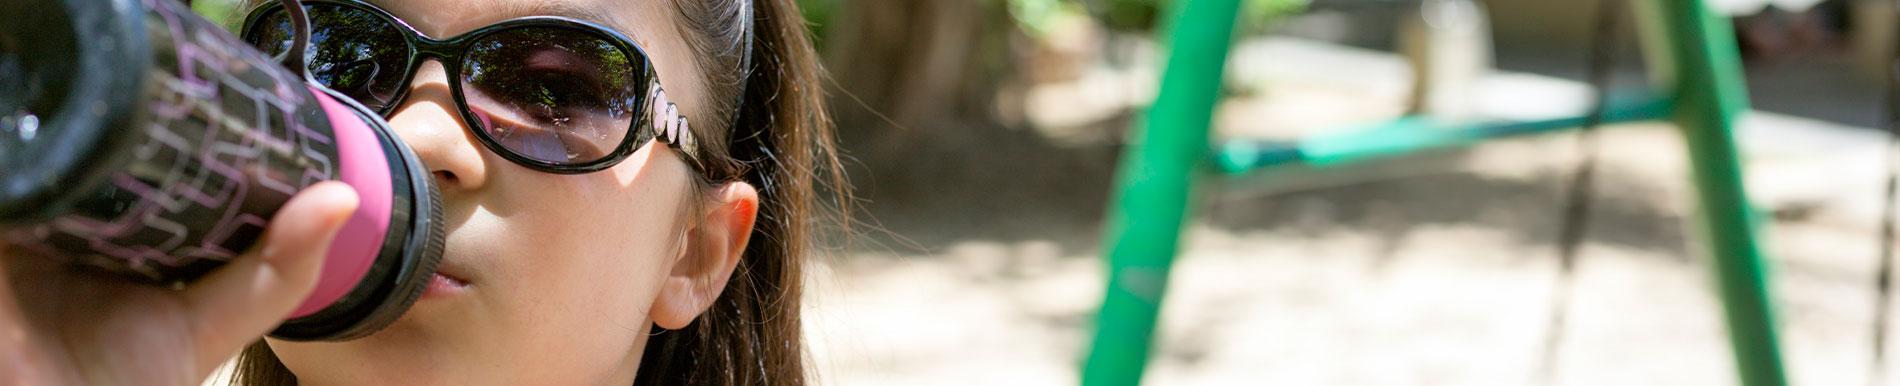 https://www.healthychildren.org/SiteCollectionImage-Homepage-Banners/Extreme-Heat.jpg